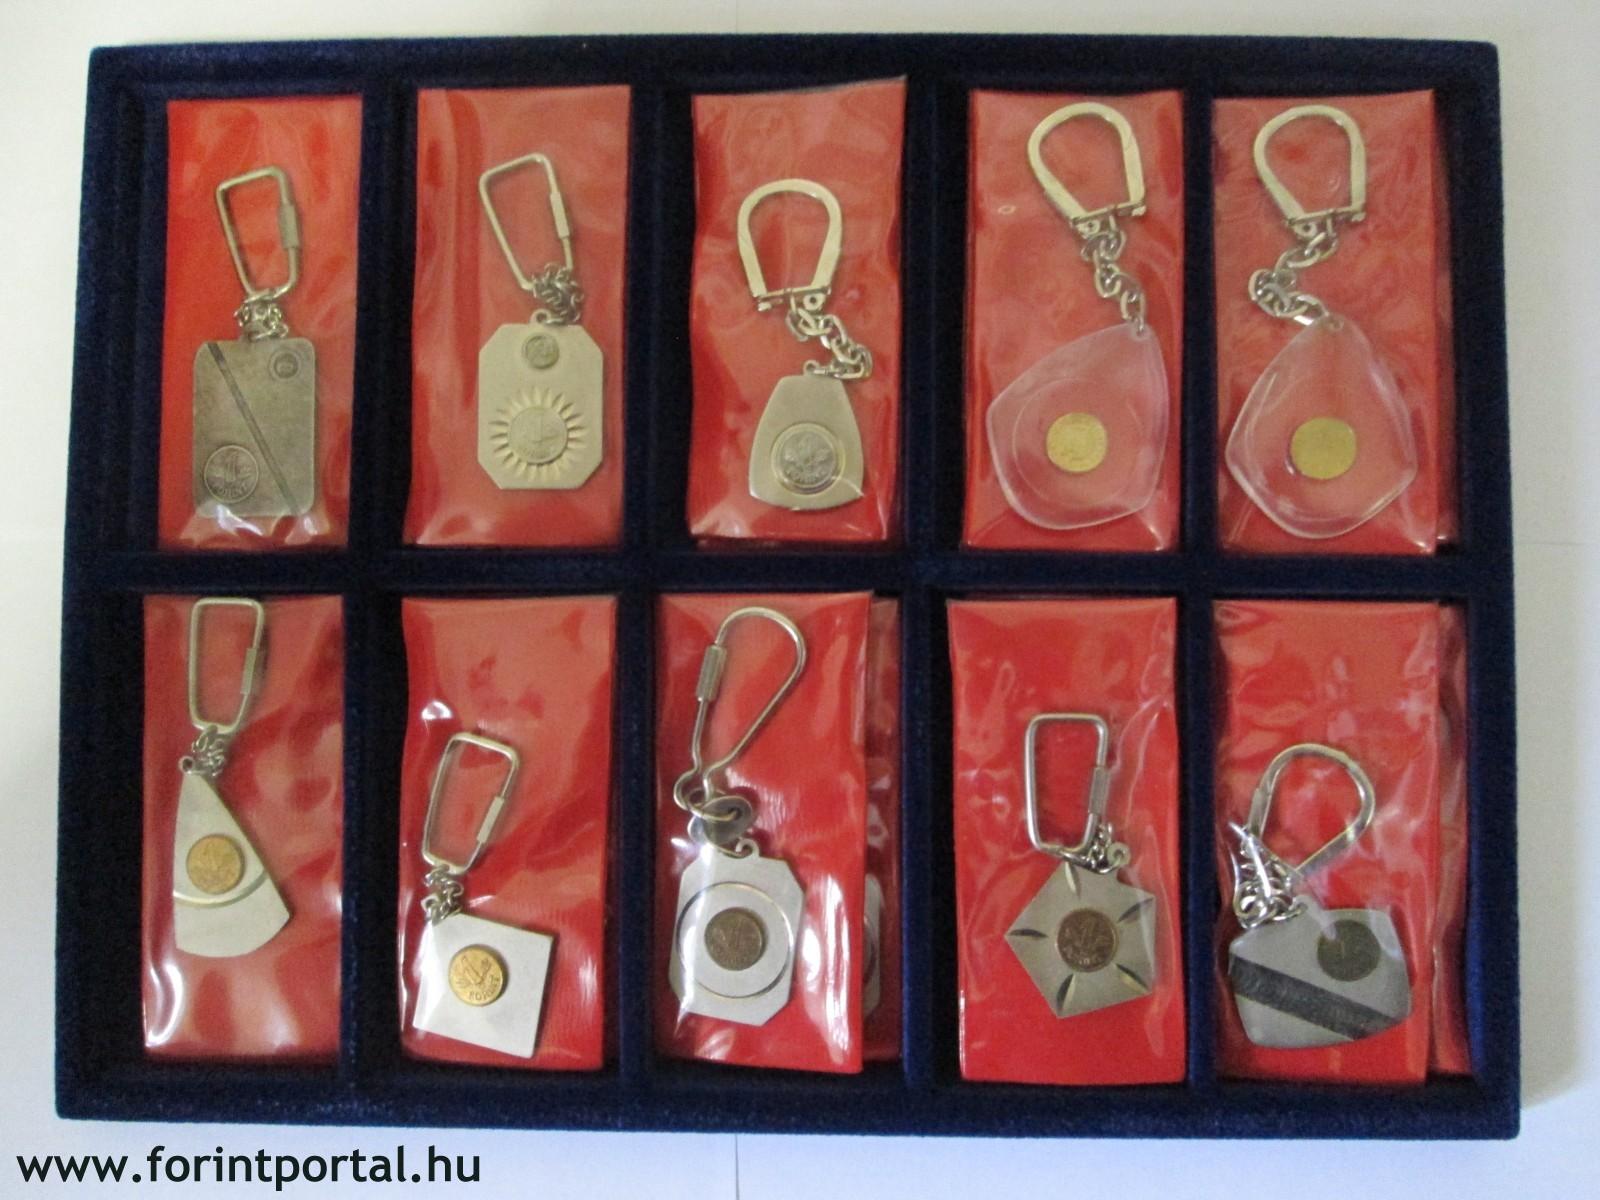 http://www.forintportal.hu/hirek/mini-1-forintos-kulcstartok/mini-1-forintos-kulcstartok-apv-allami-penzvero-regi-kulcstarto-1ft_01.jpg